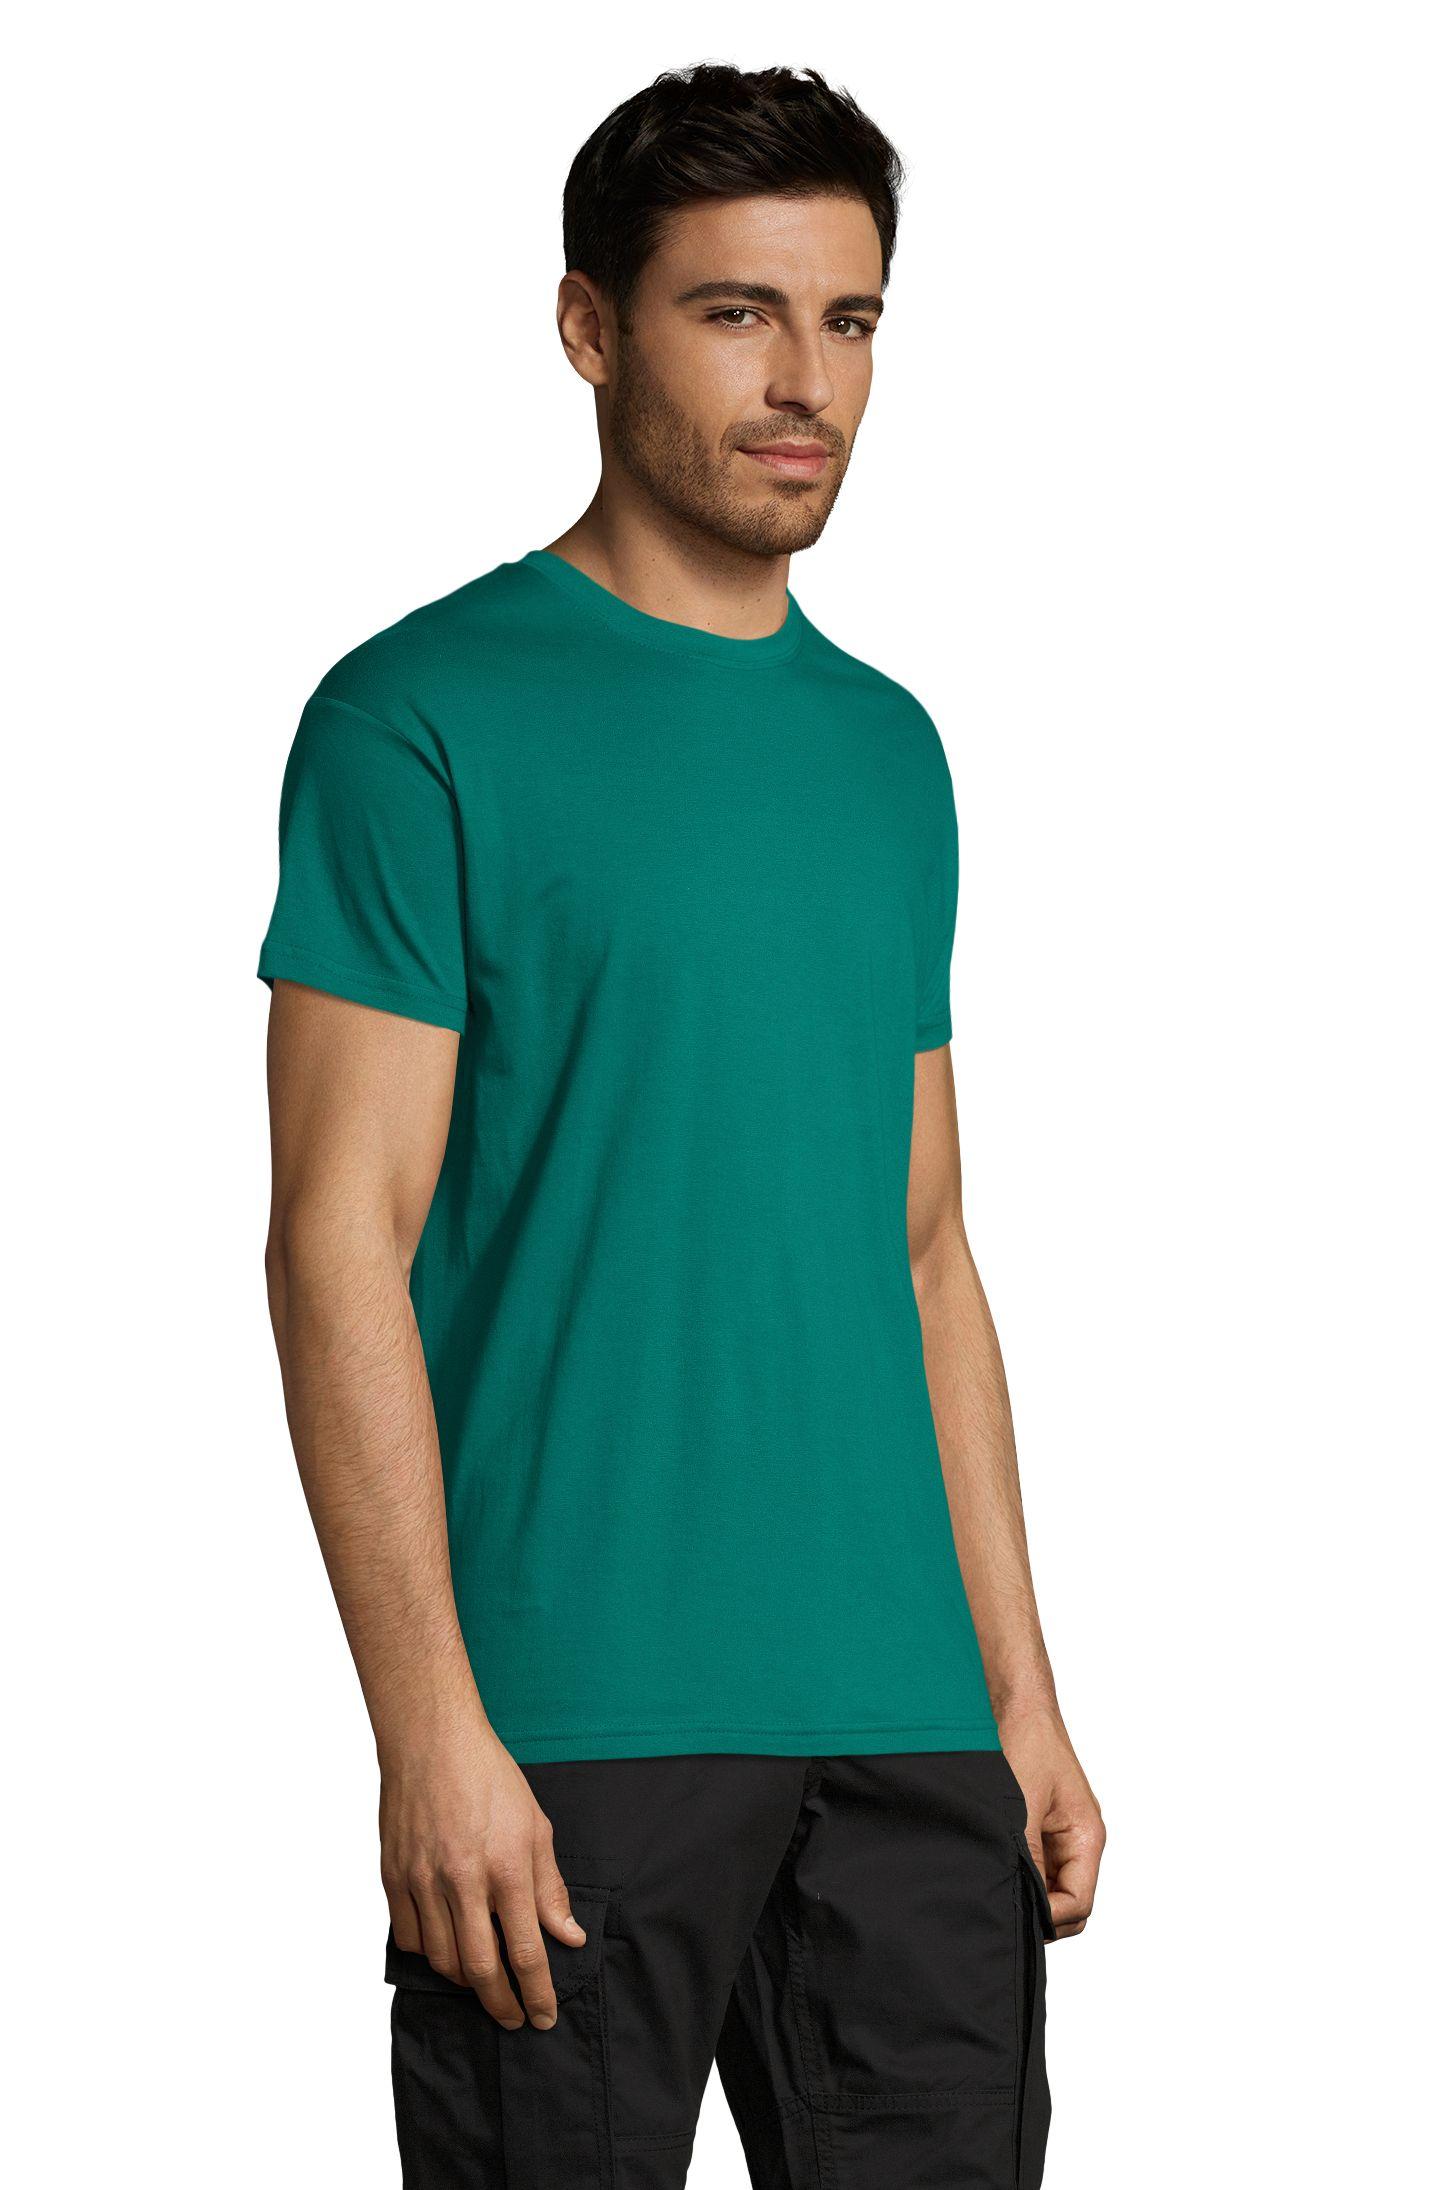 270 - Emerald